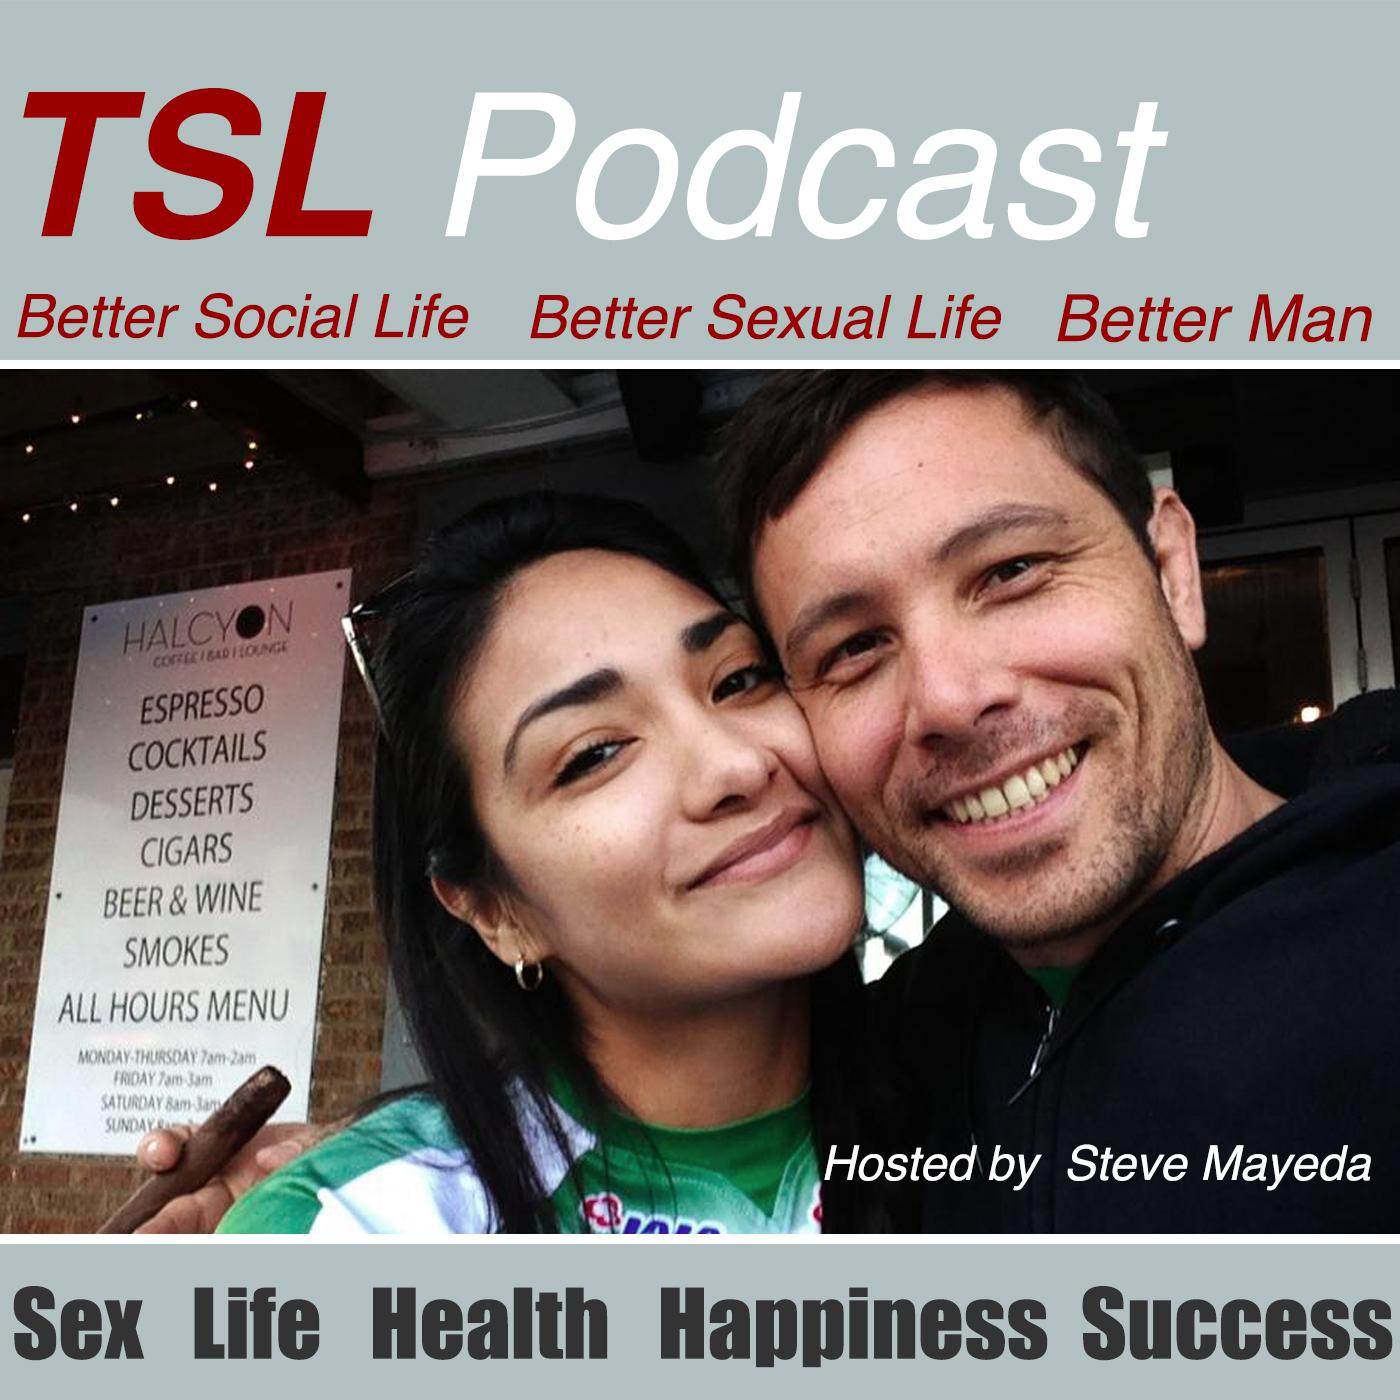 TSL Podcast - Steve Mayeda : Dating & Seduction Connoisseur